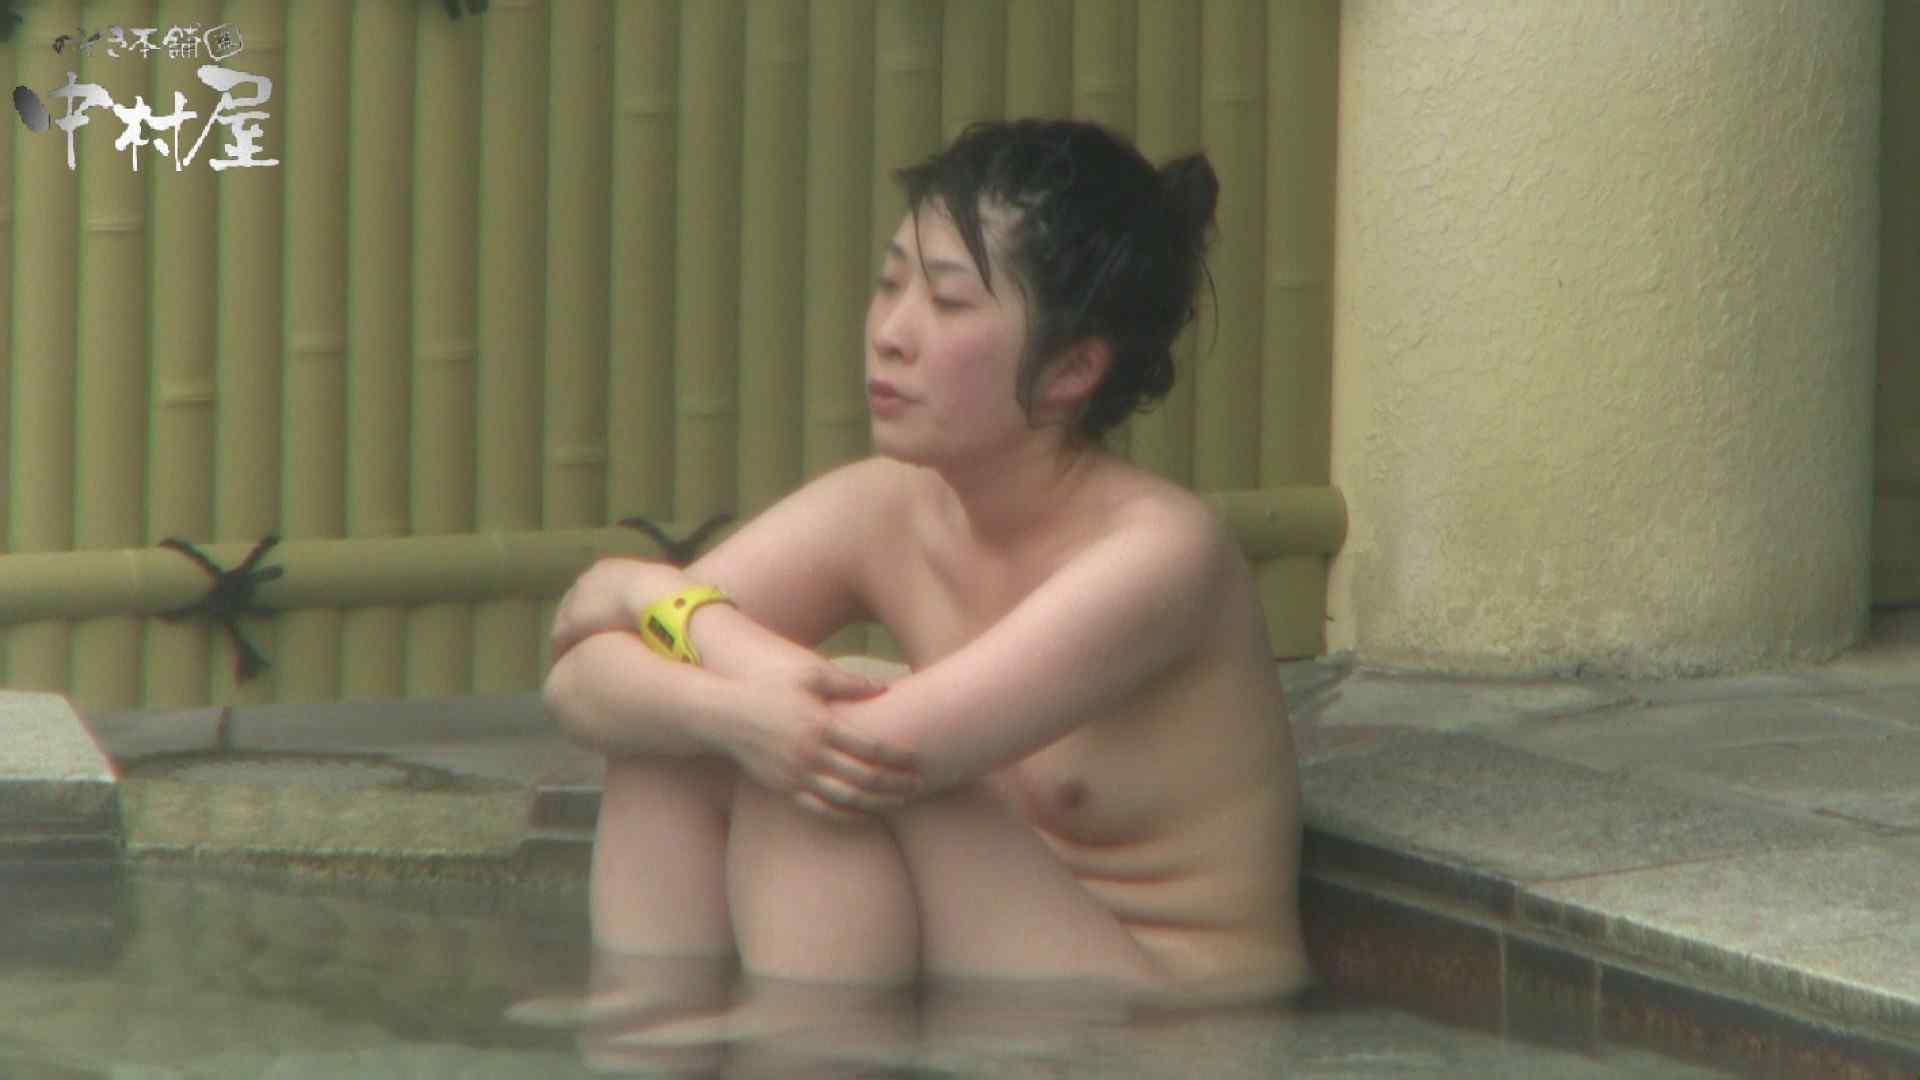 Aquaな露天風呂Vol.955 盗撮師作品  85pic 54